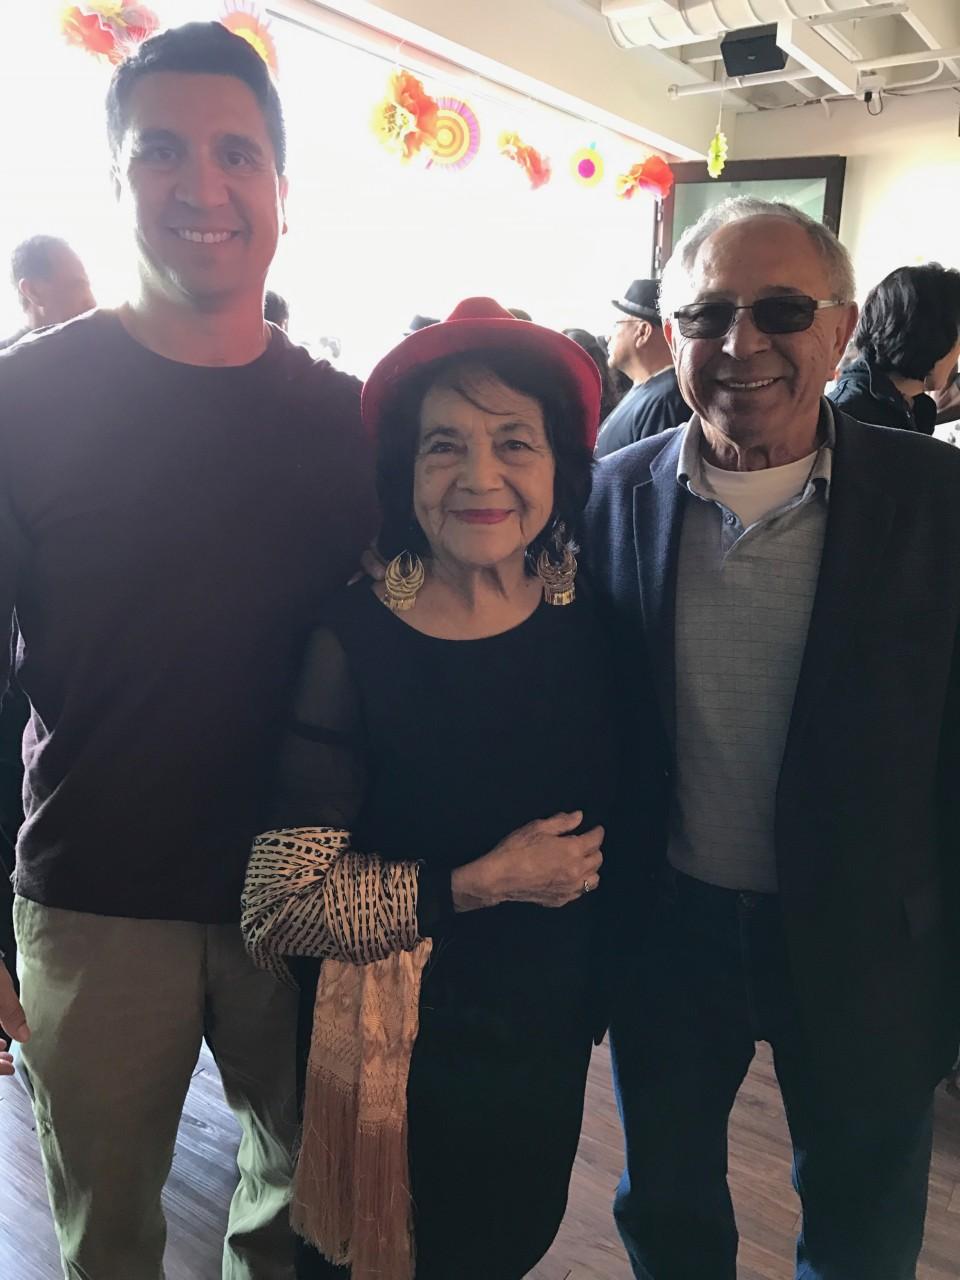 L-R: BenitoLink reporter, Frank Perez, Dolores Huerta, and the reporter's father, Frank Perez. Photo courtesy of Rick Rivas.